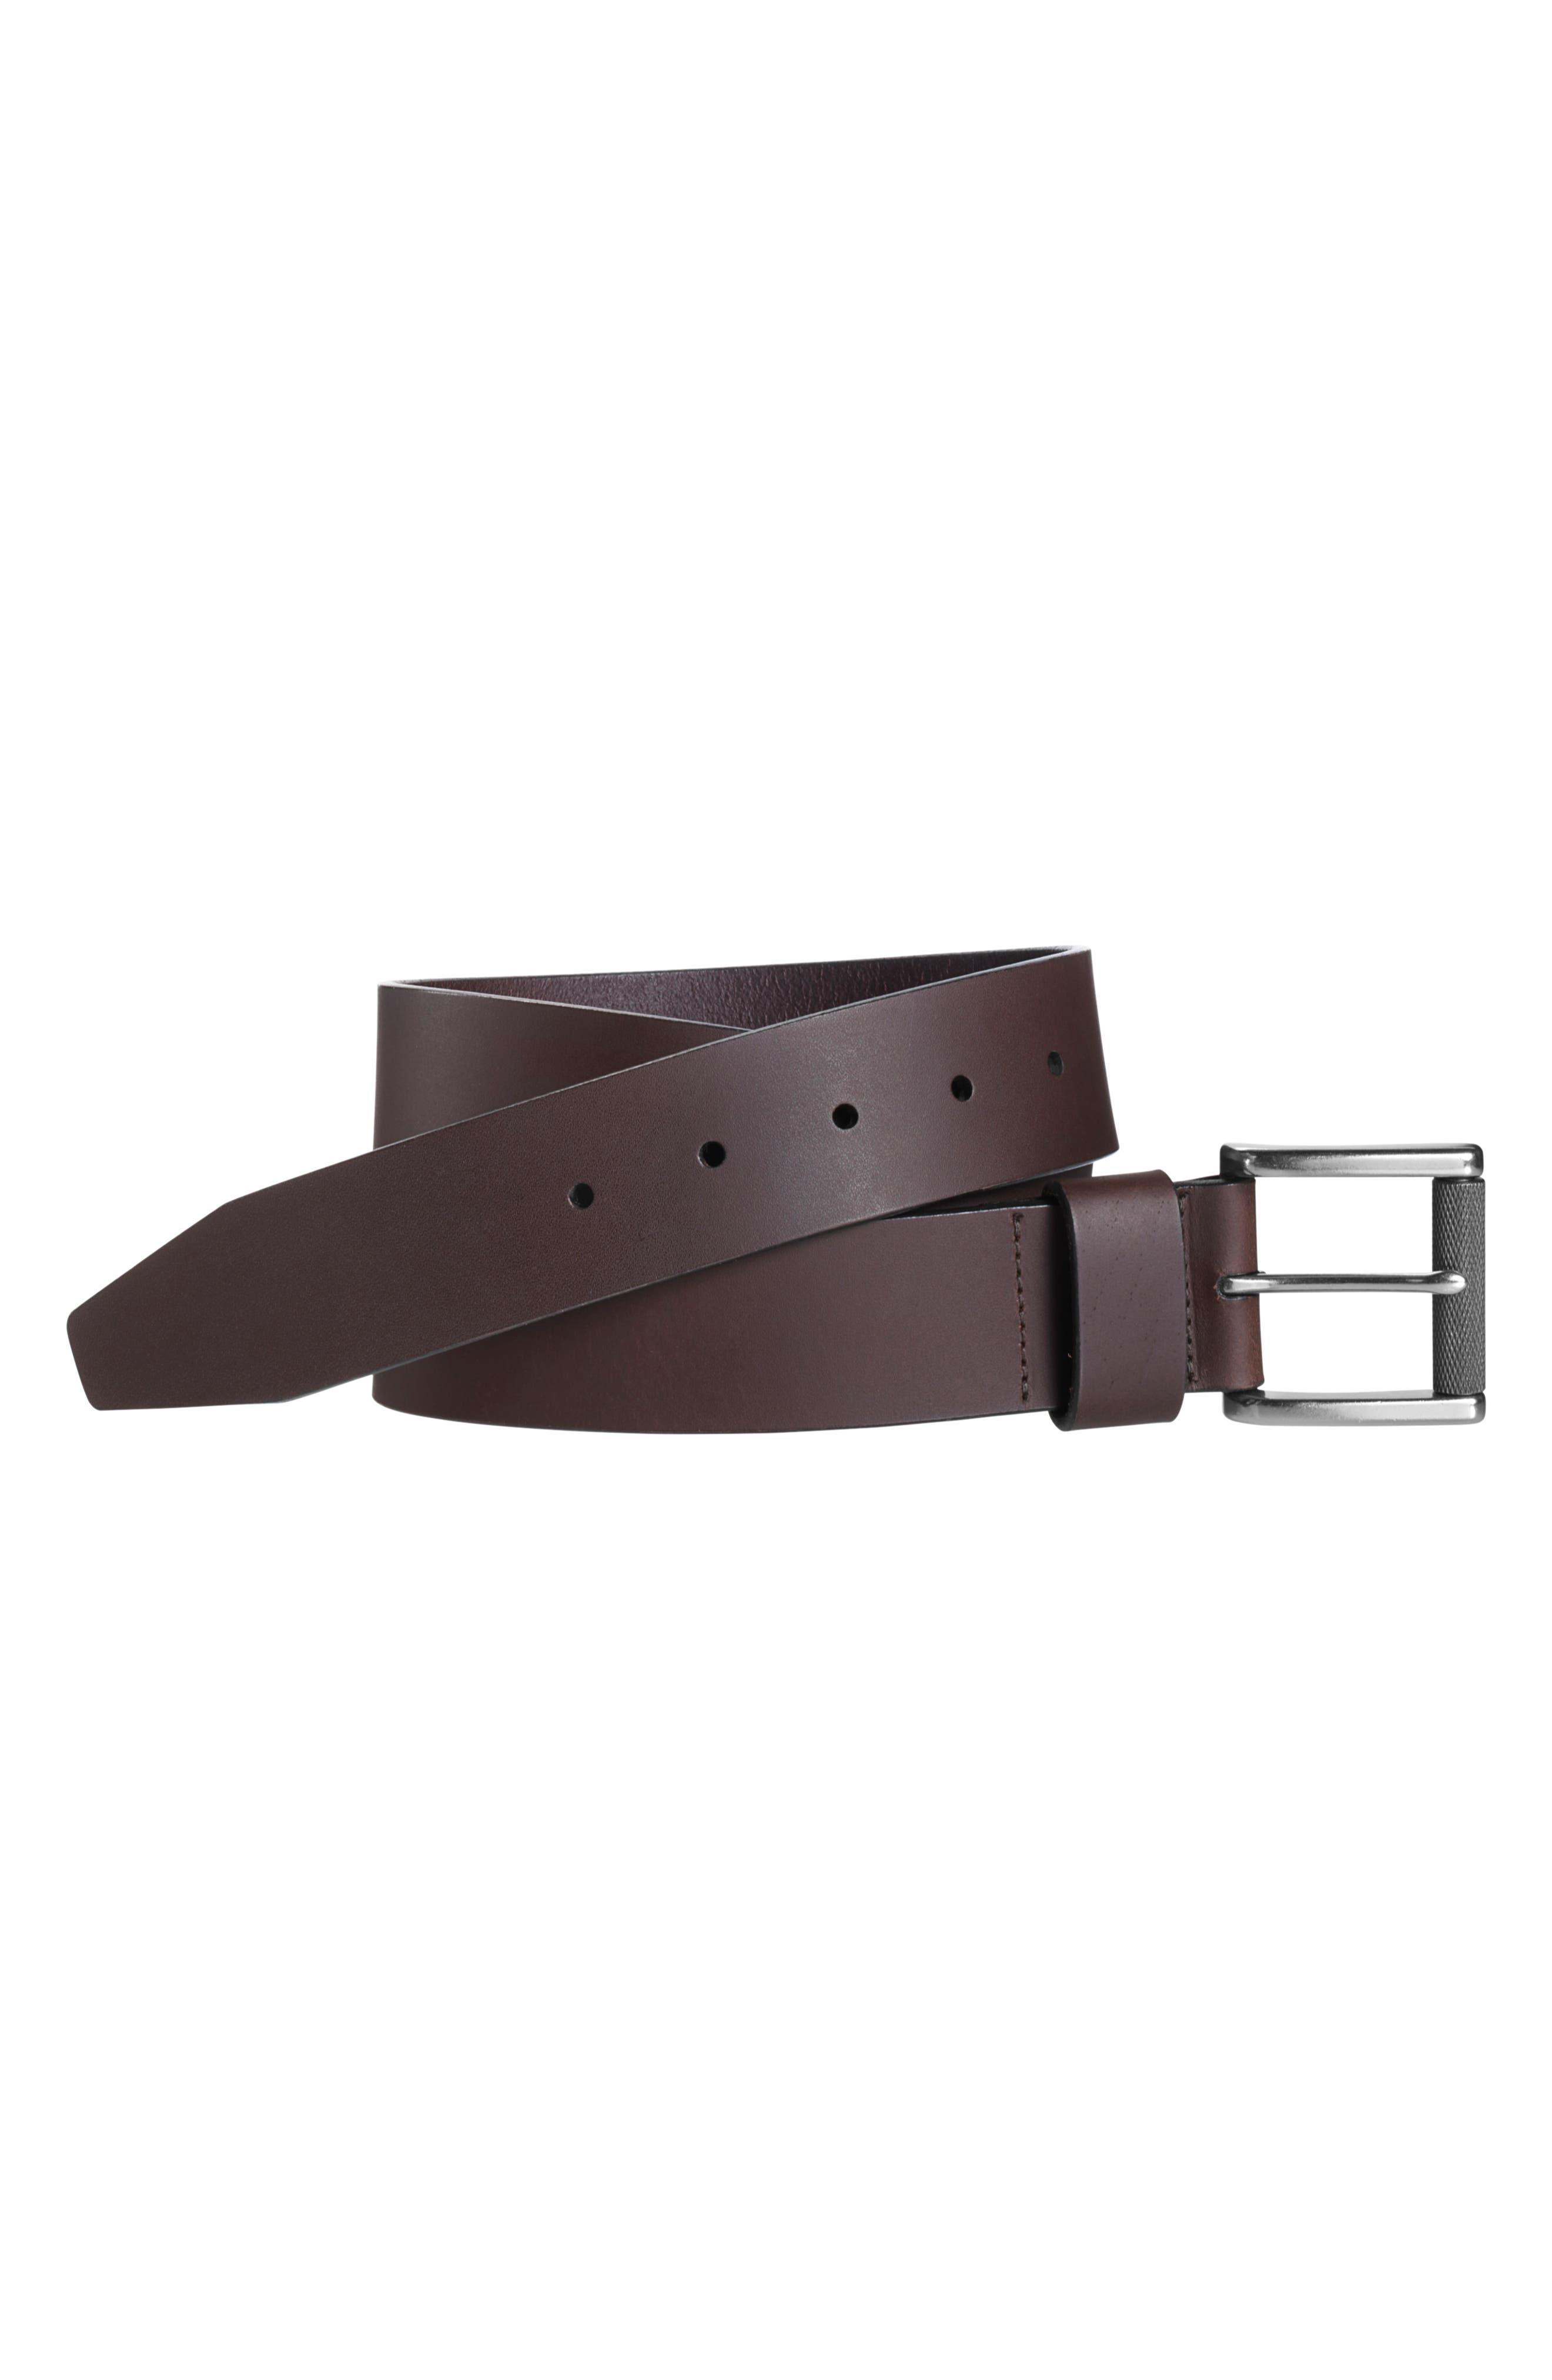 Men's Johnson & Murphy Roller Buckle Leather Belt